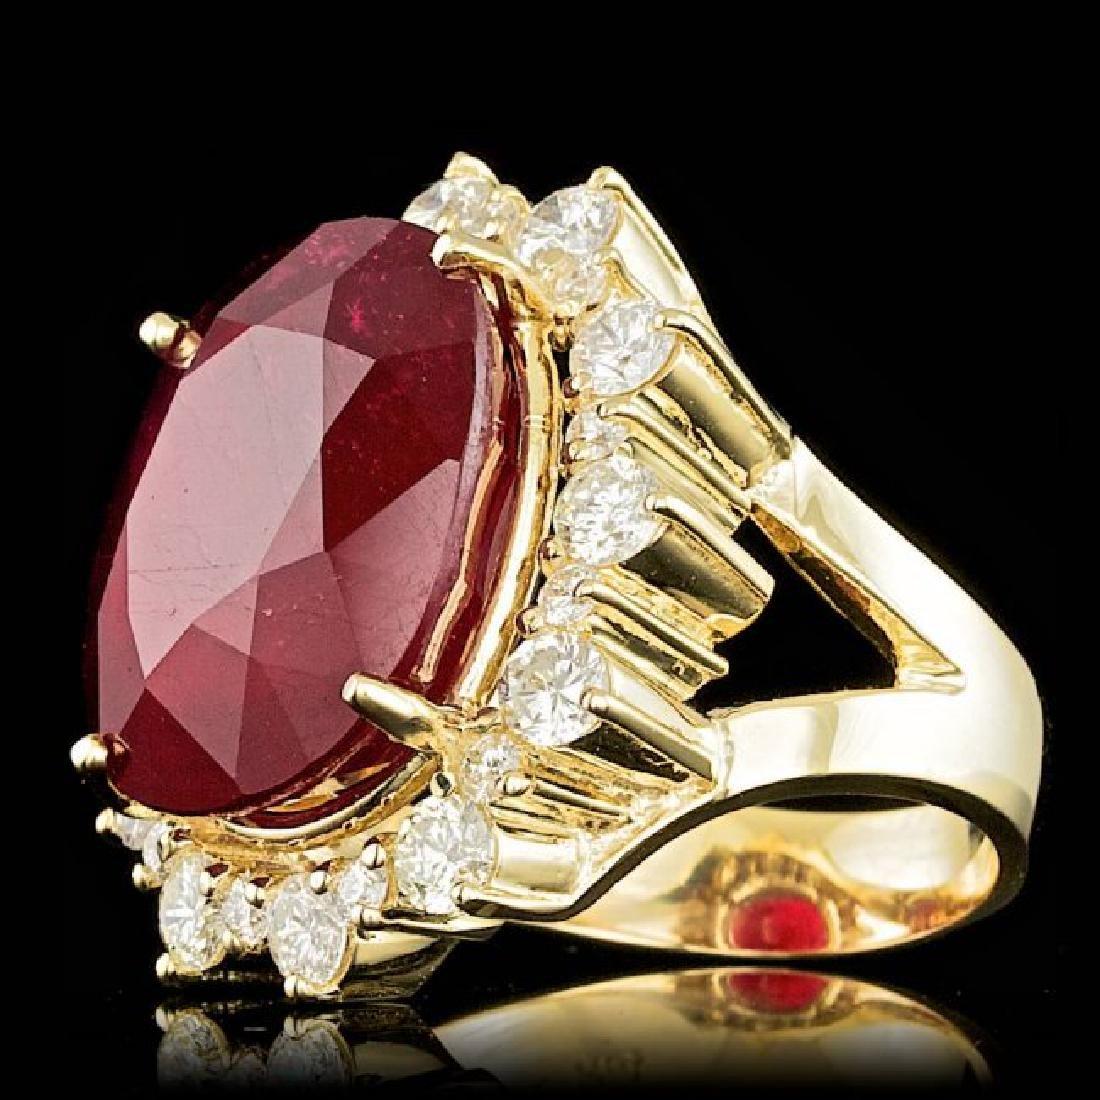 14k Yellow Gold 25.50ct Ruby 2.25ct Diamond Ring - 2